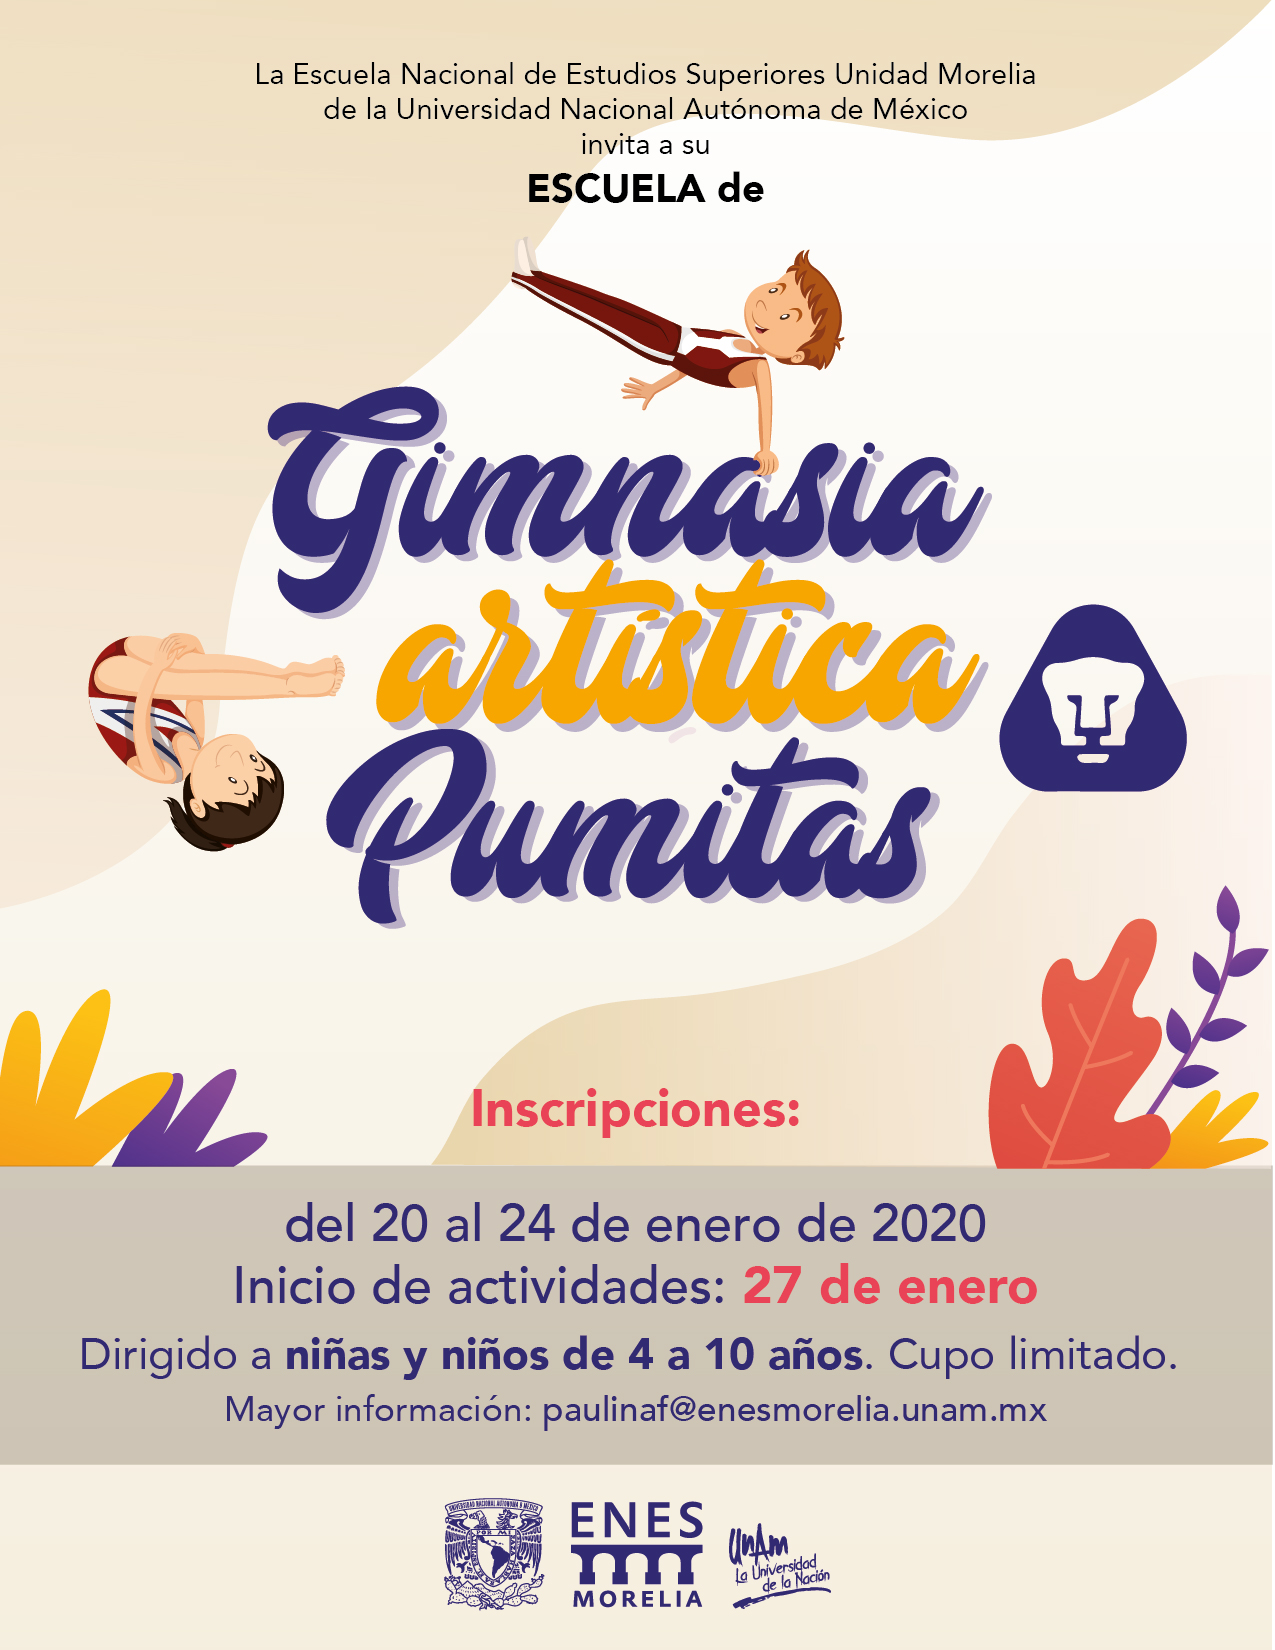 Gimnasia-pumitas-2020-01